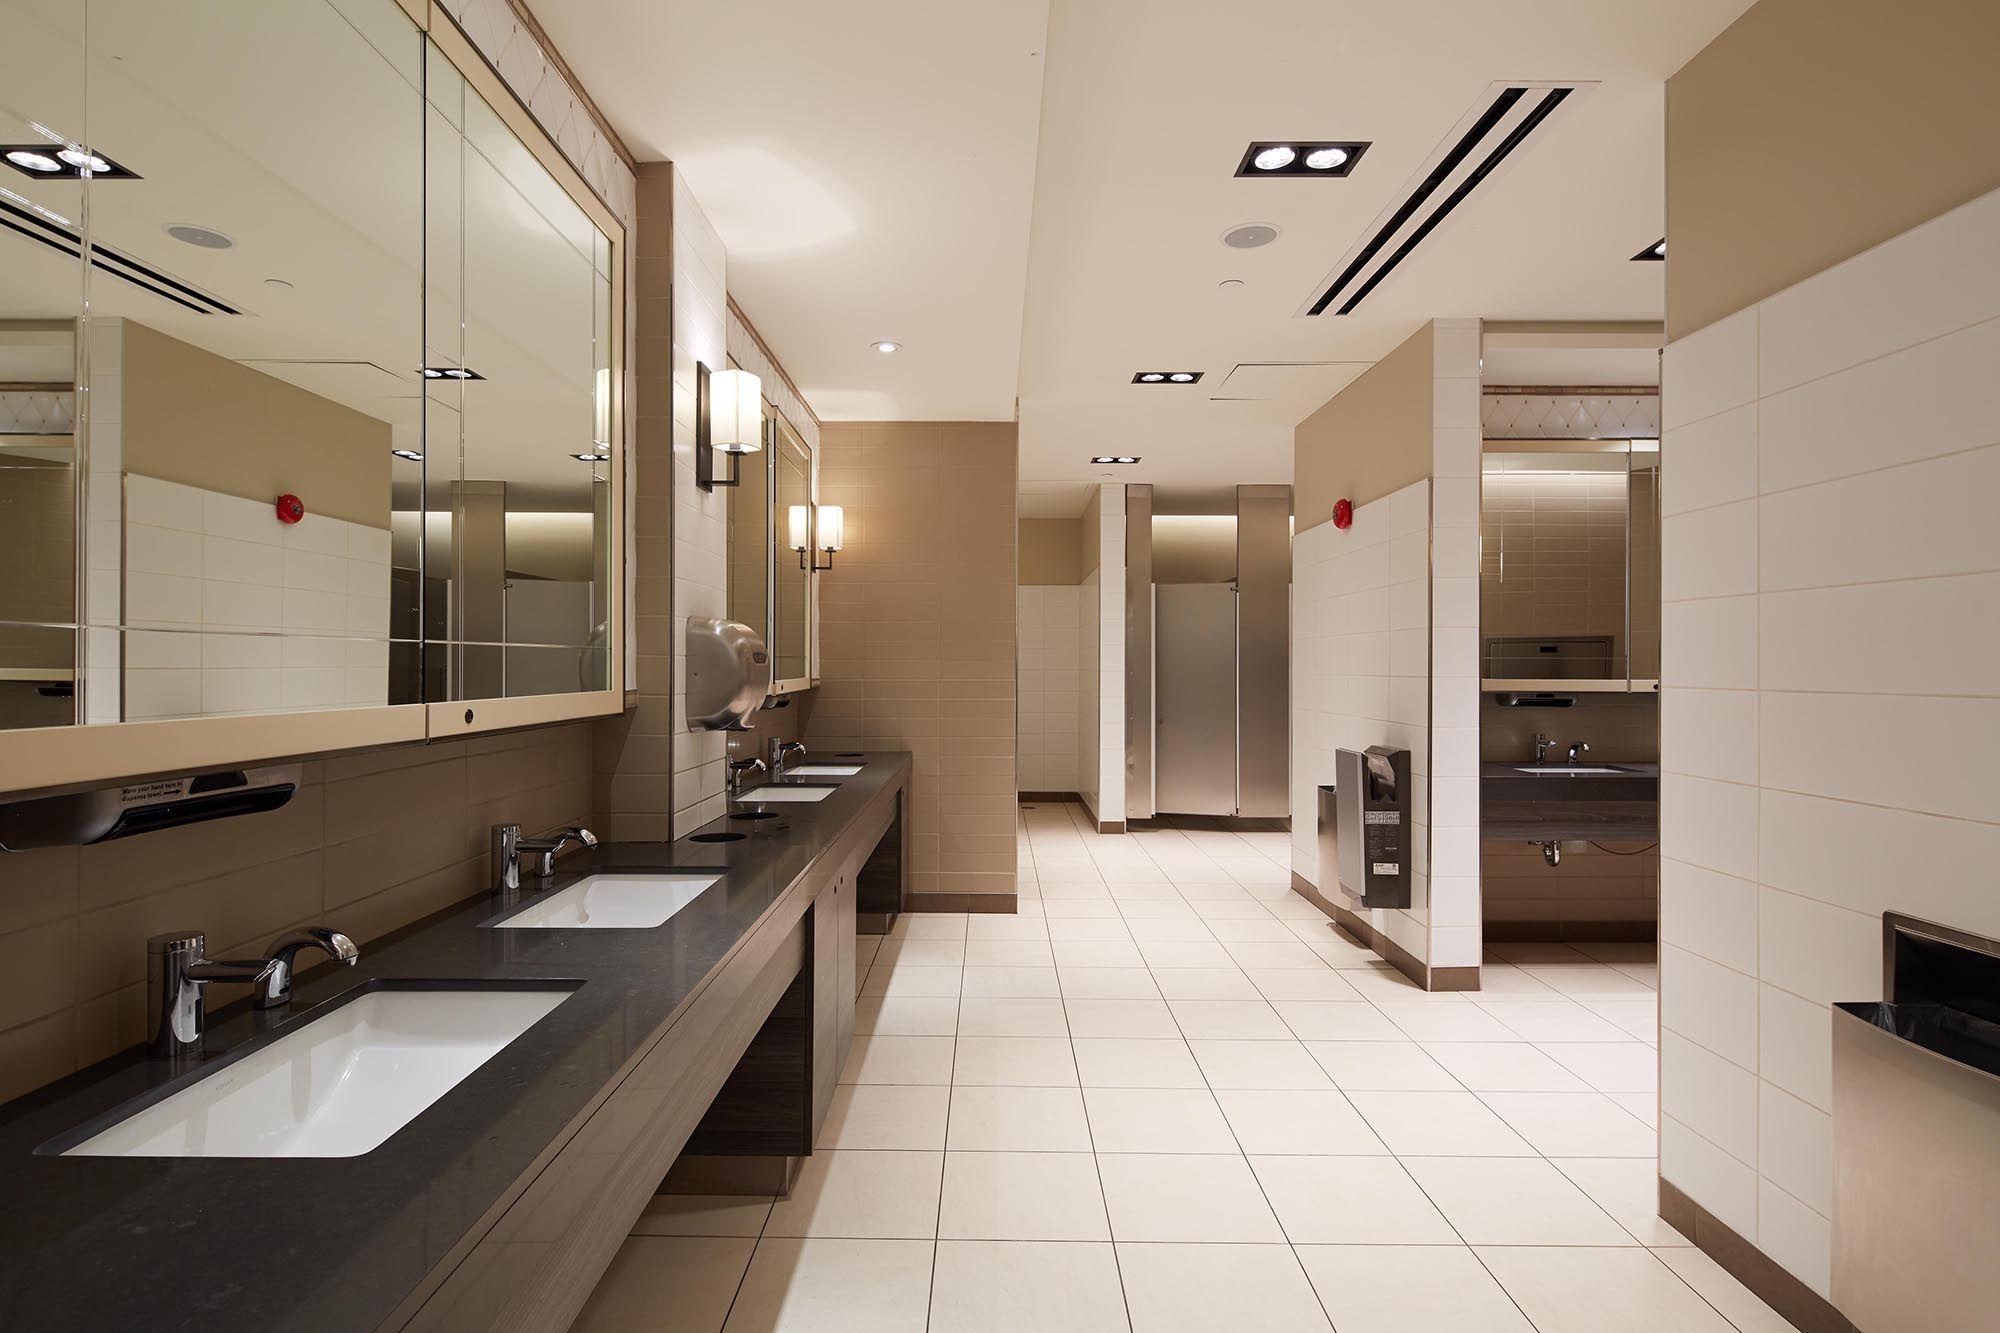 Lighting Basement Washroom Stairs: Image Result For Shopping Mall Bathroom